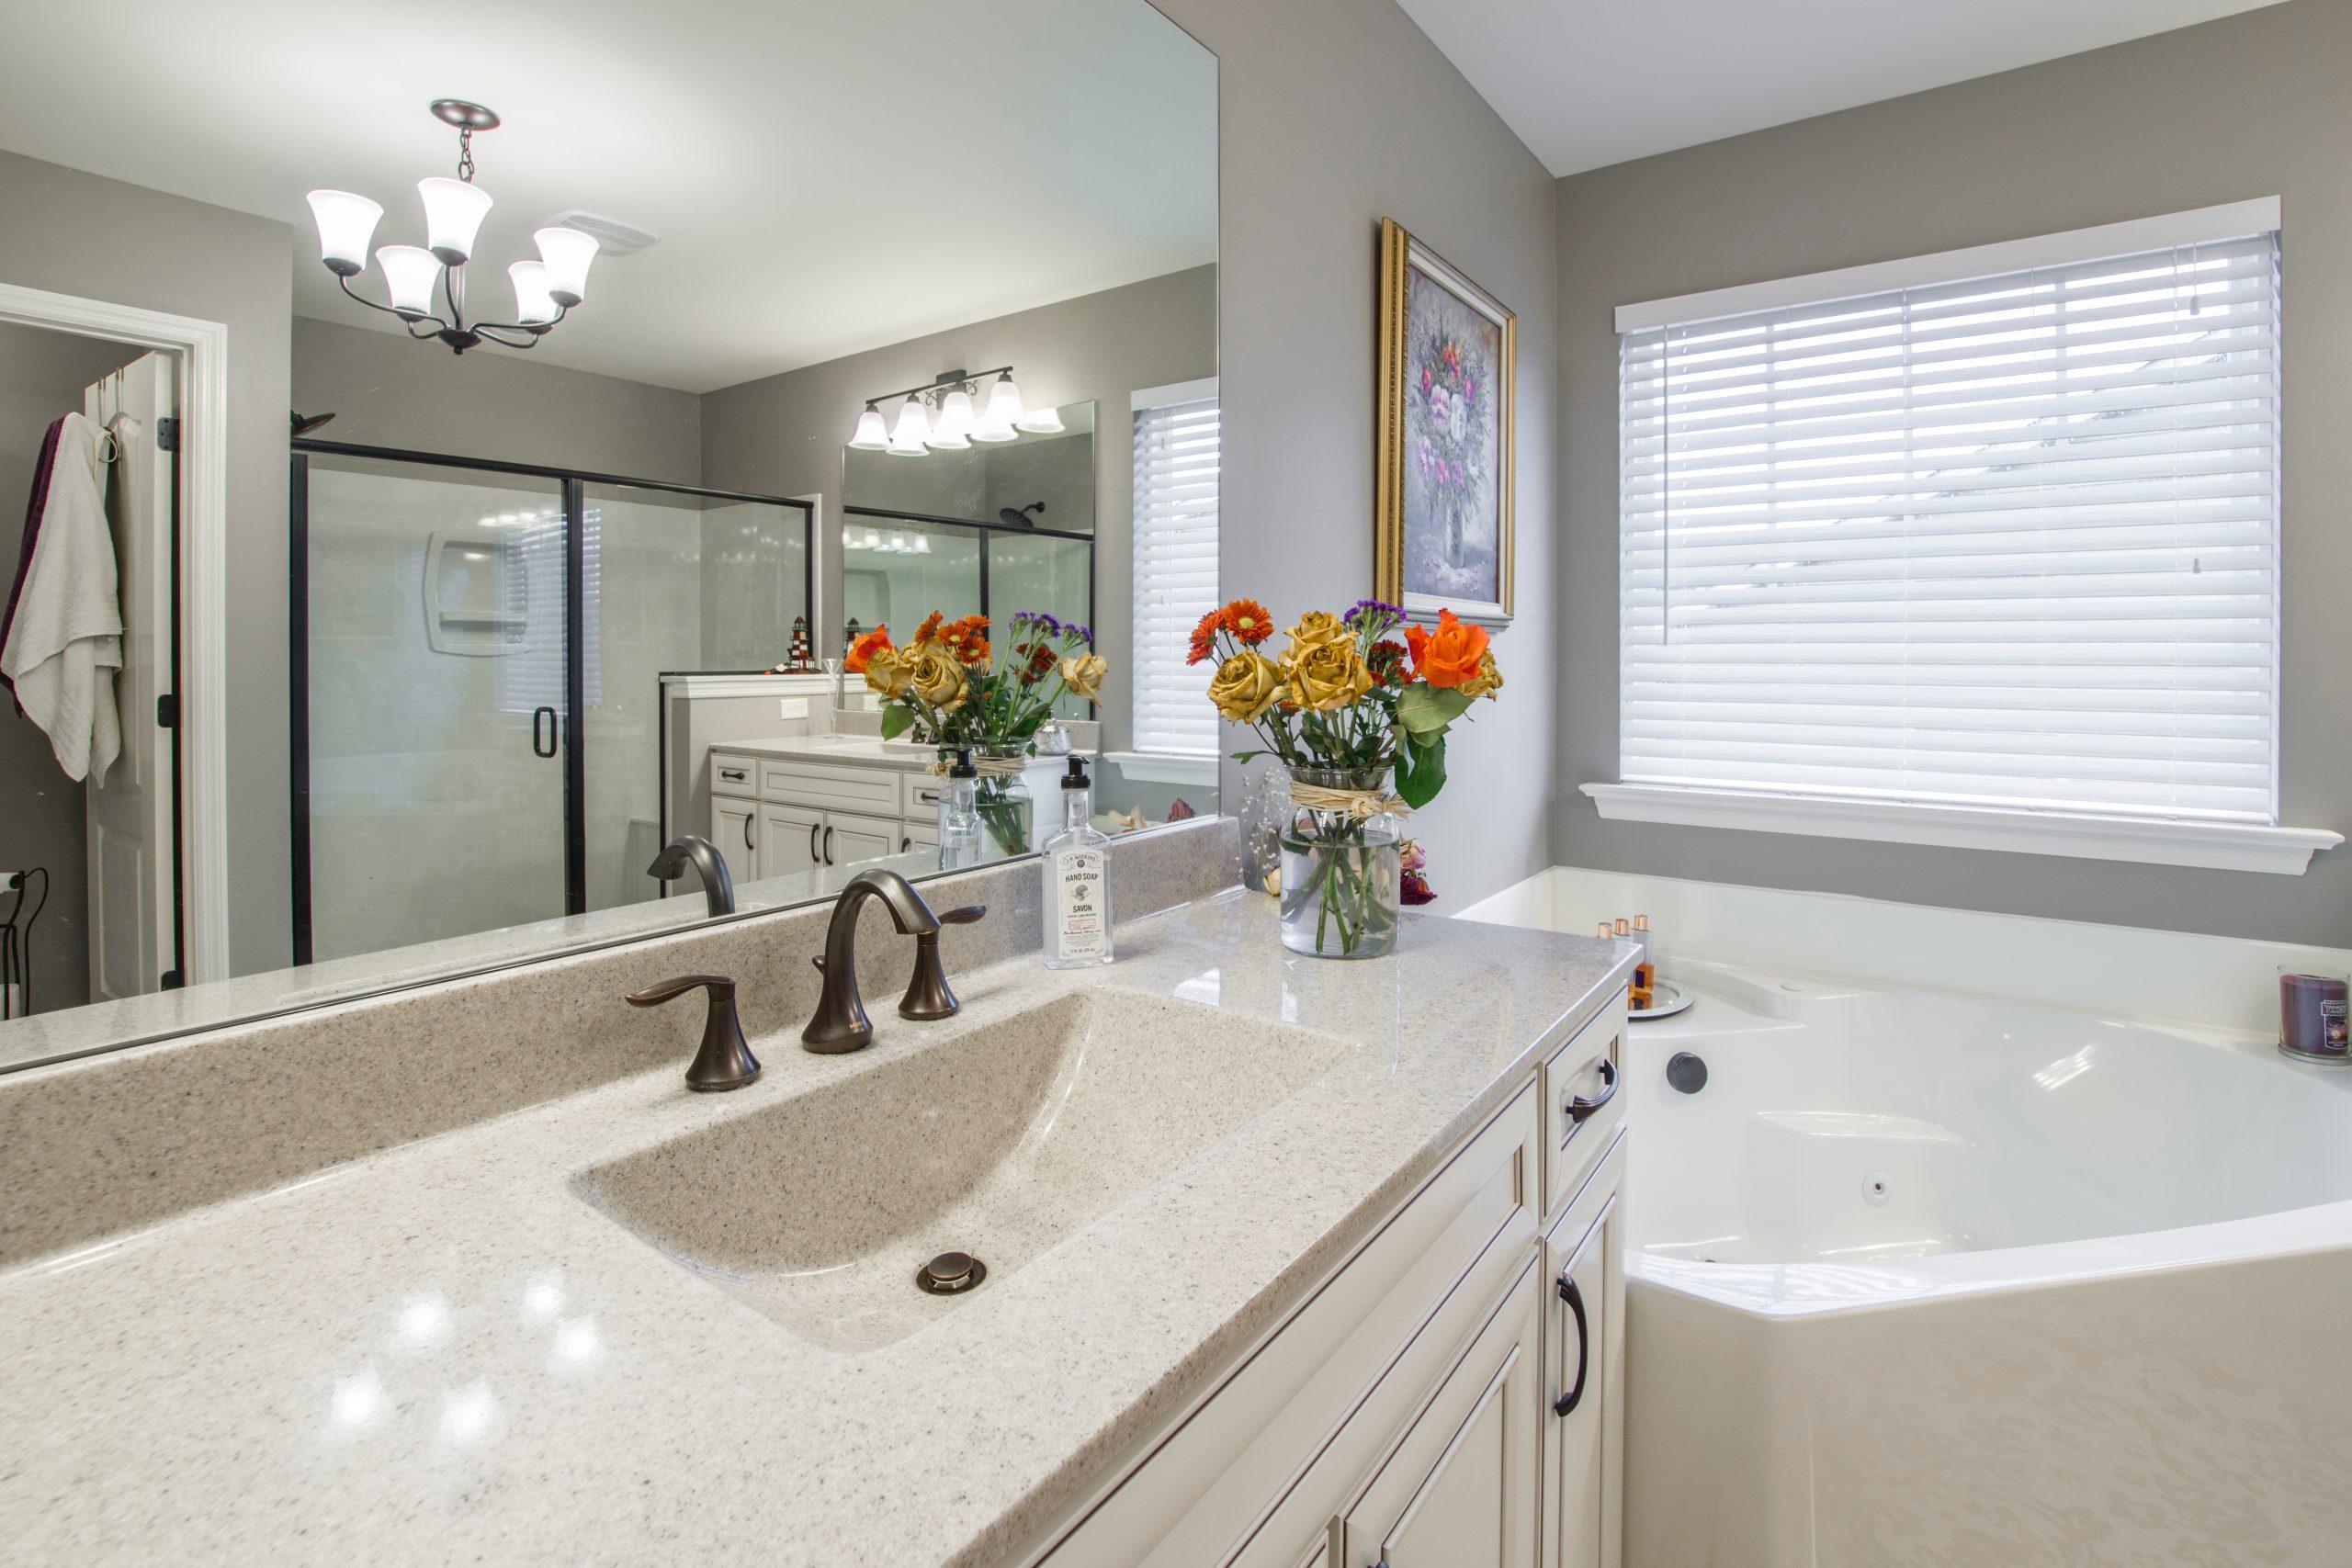 Leveling A Bathroom Vanity Wobble Wedges